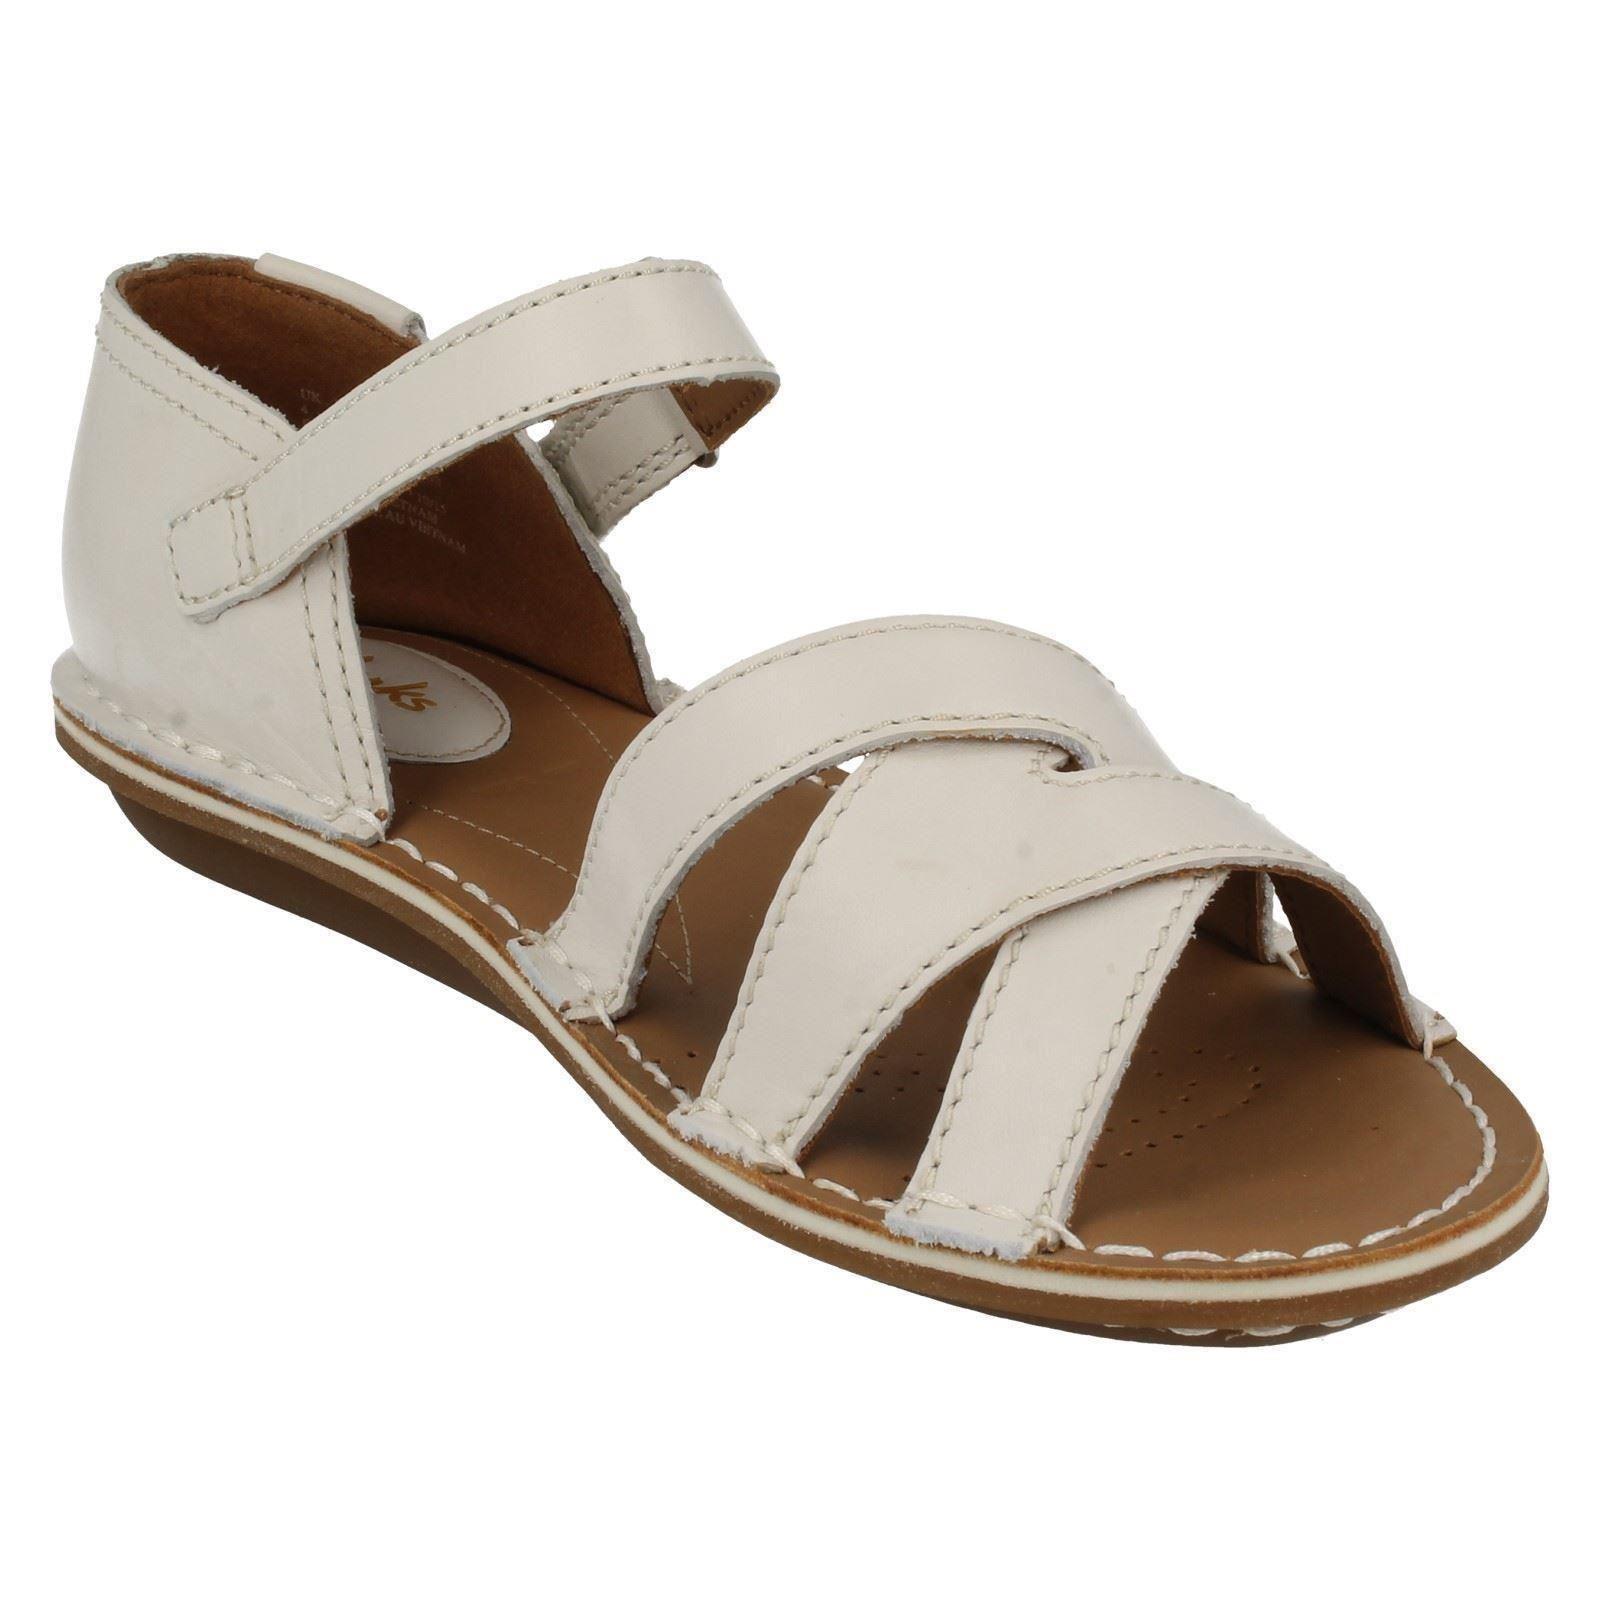 Clarks Ladies Summer Sandals Tustin Sahara Ebay